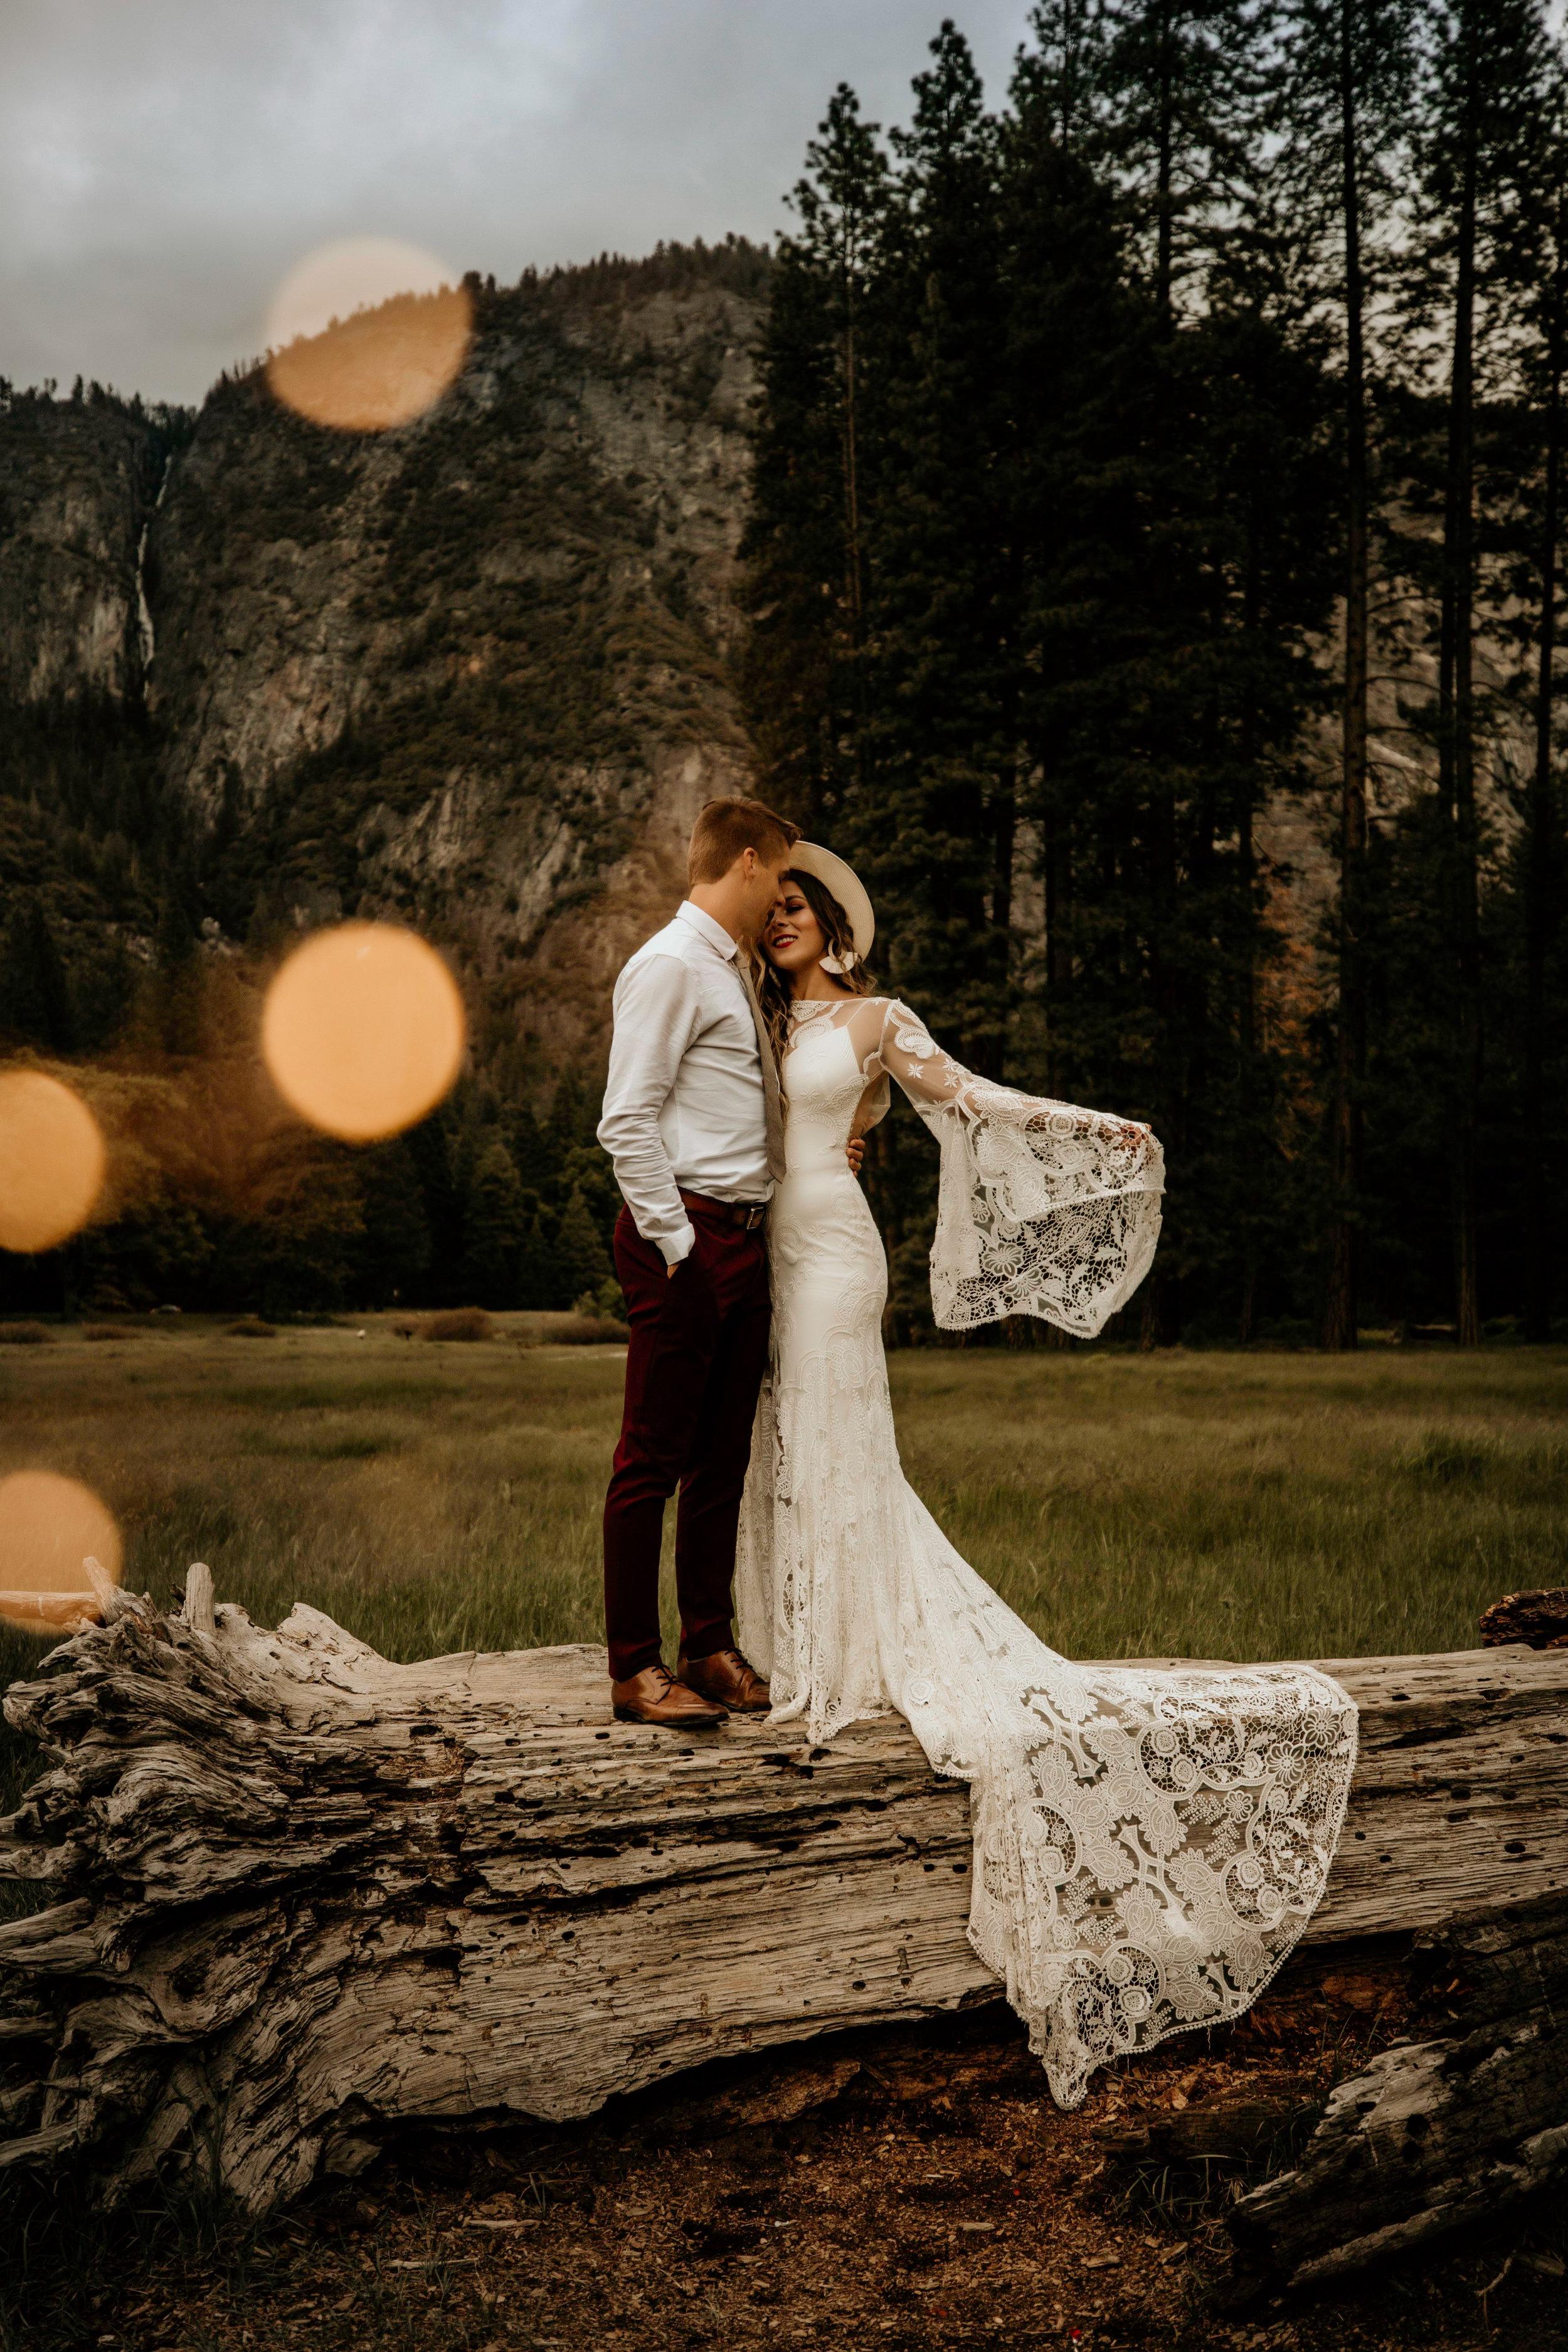 yosimite-national-park-elopement-wedding-boho-bride--3.jpg